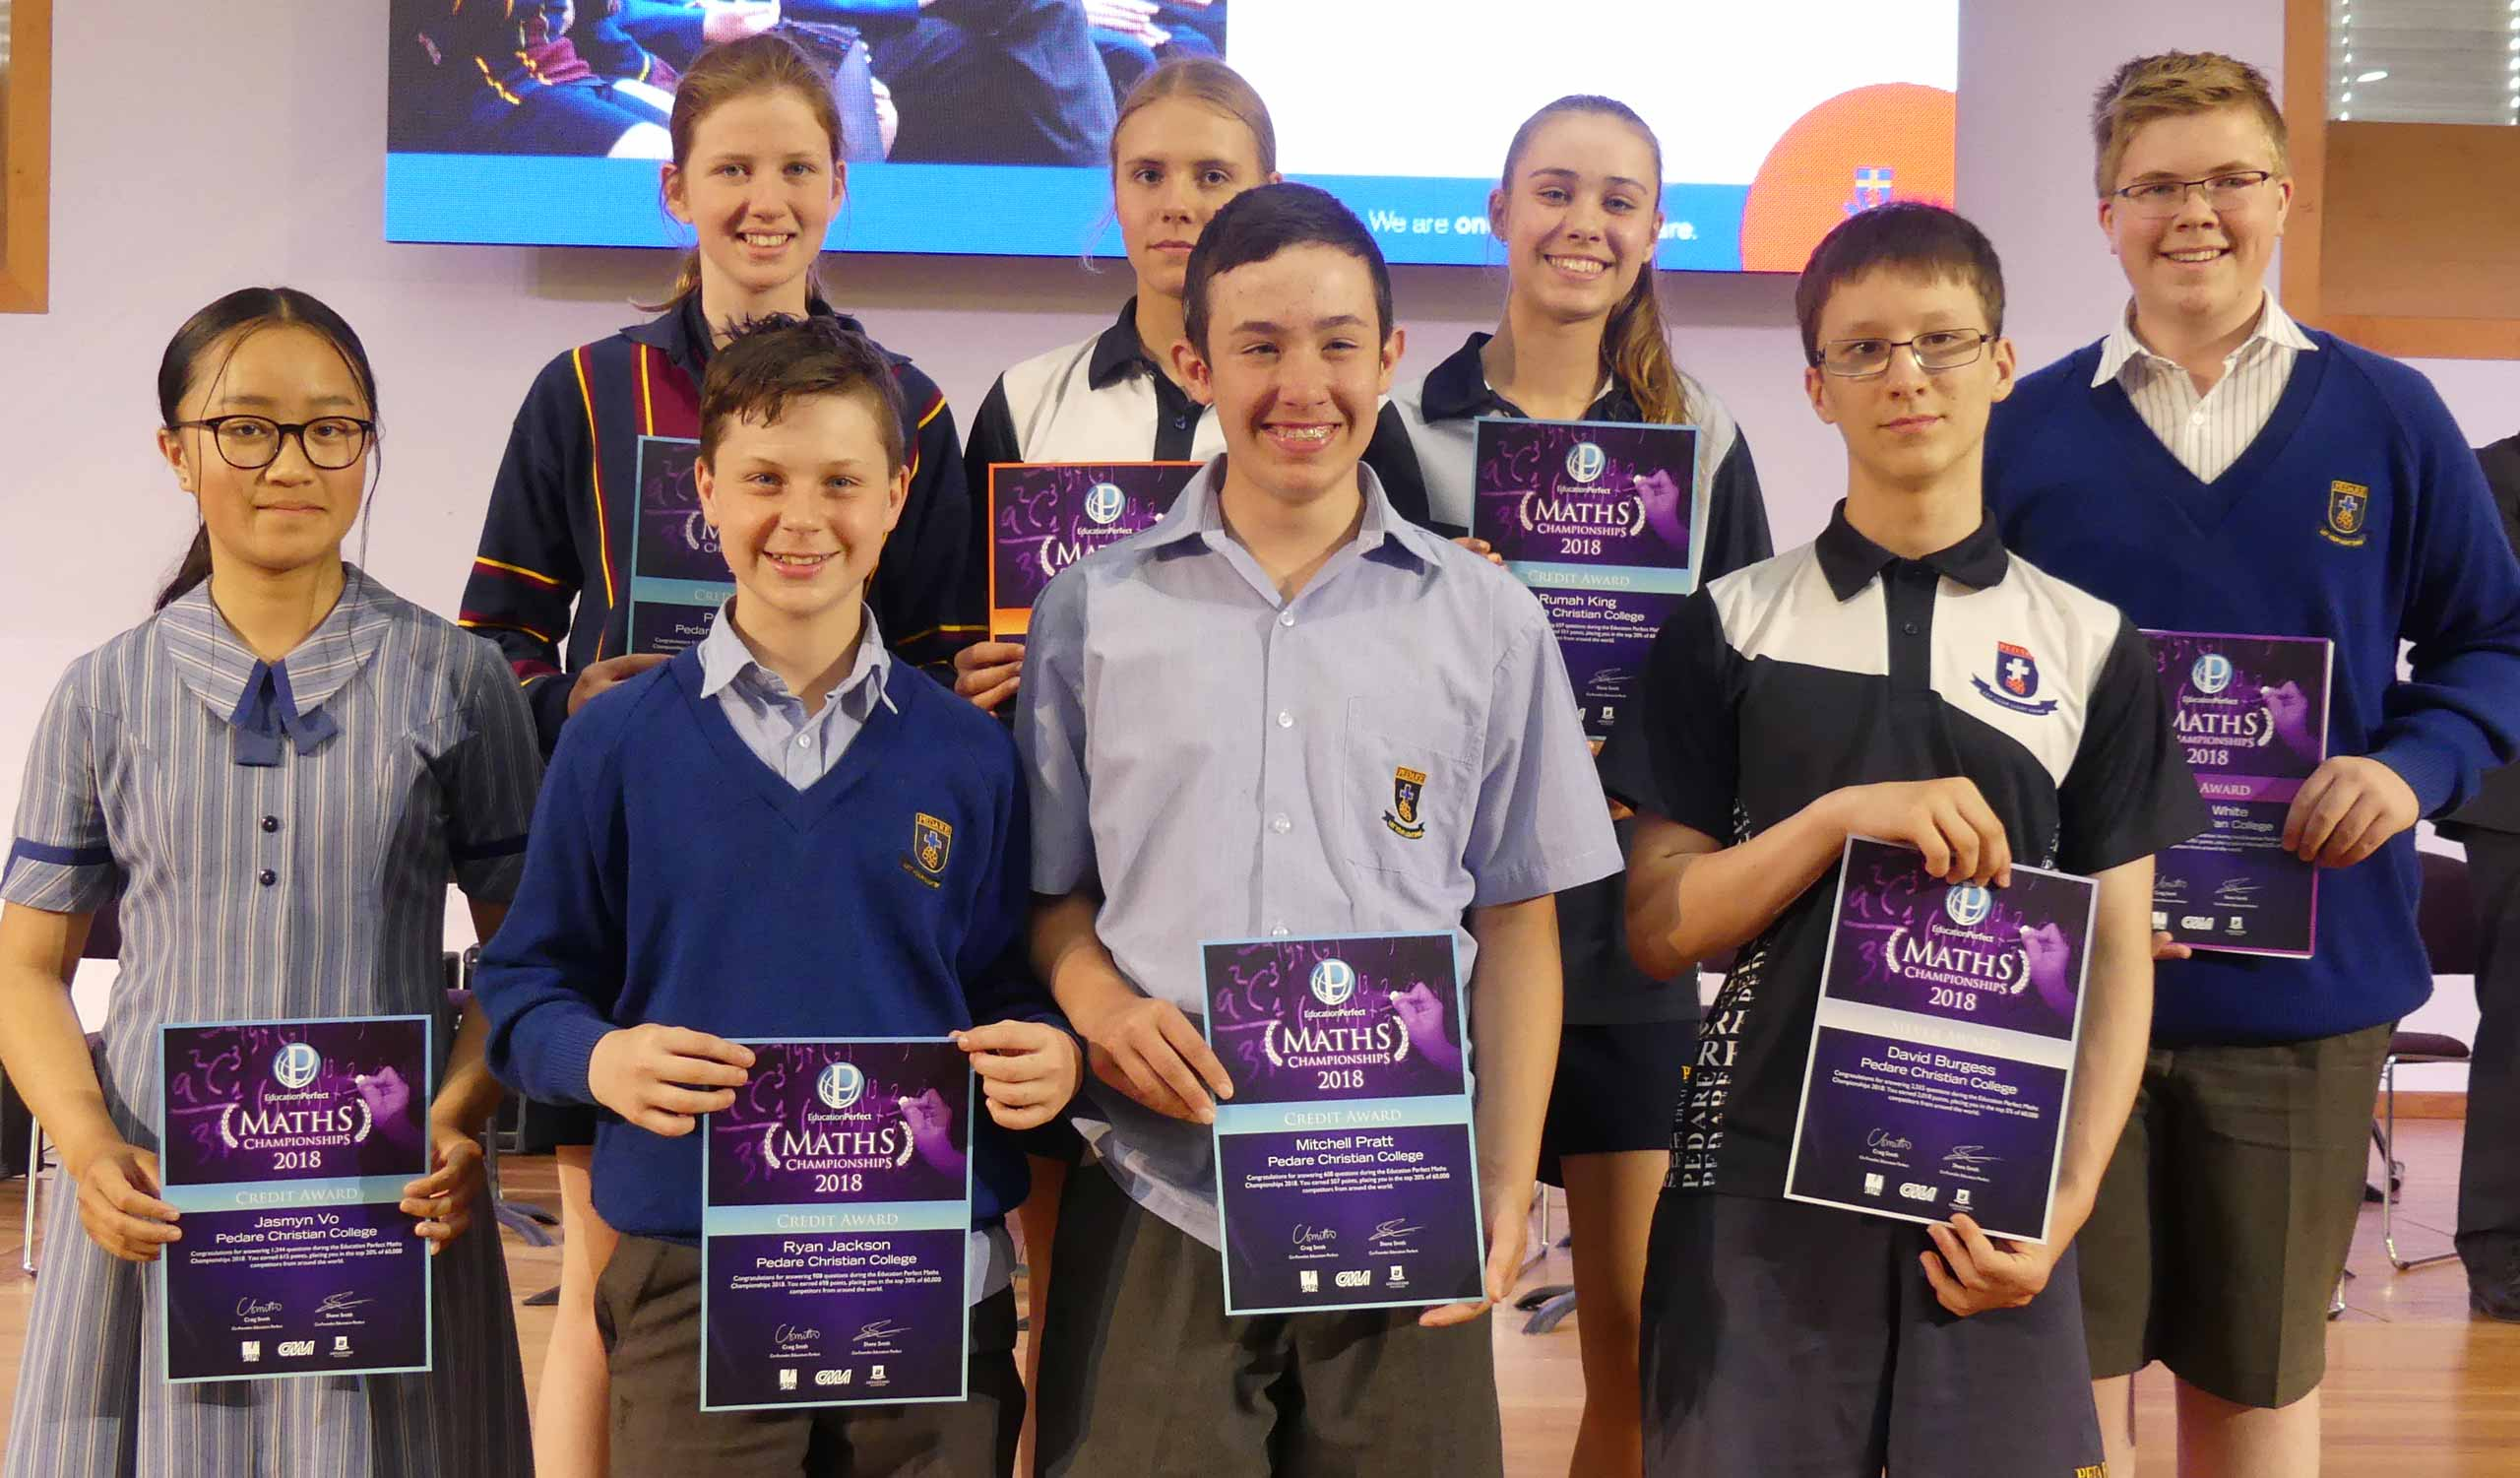 EducationPerfect-Maths-Championship